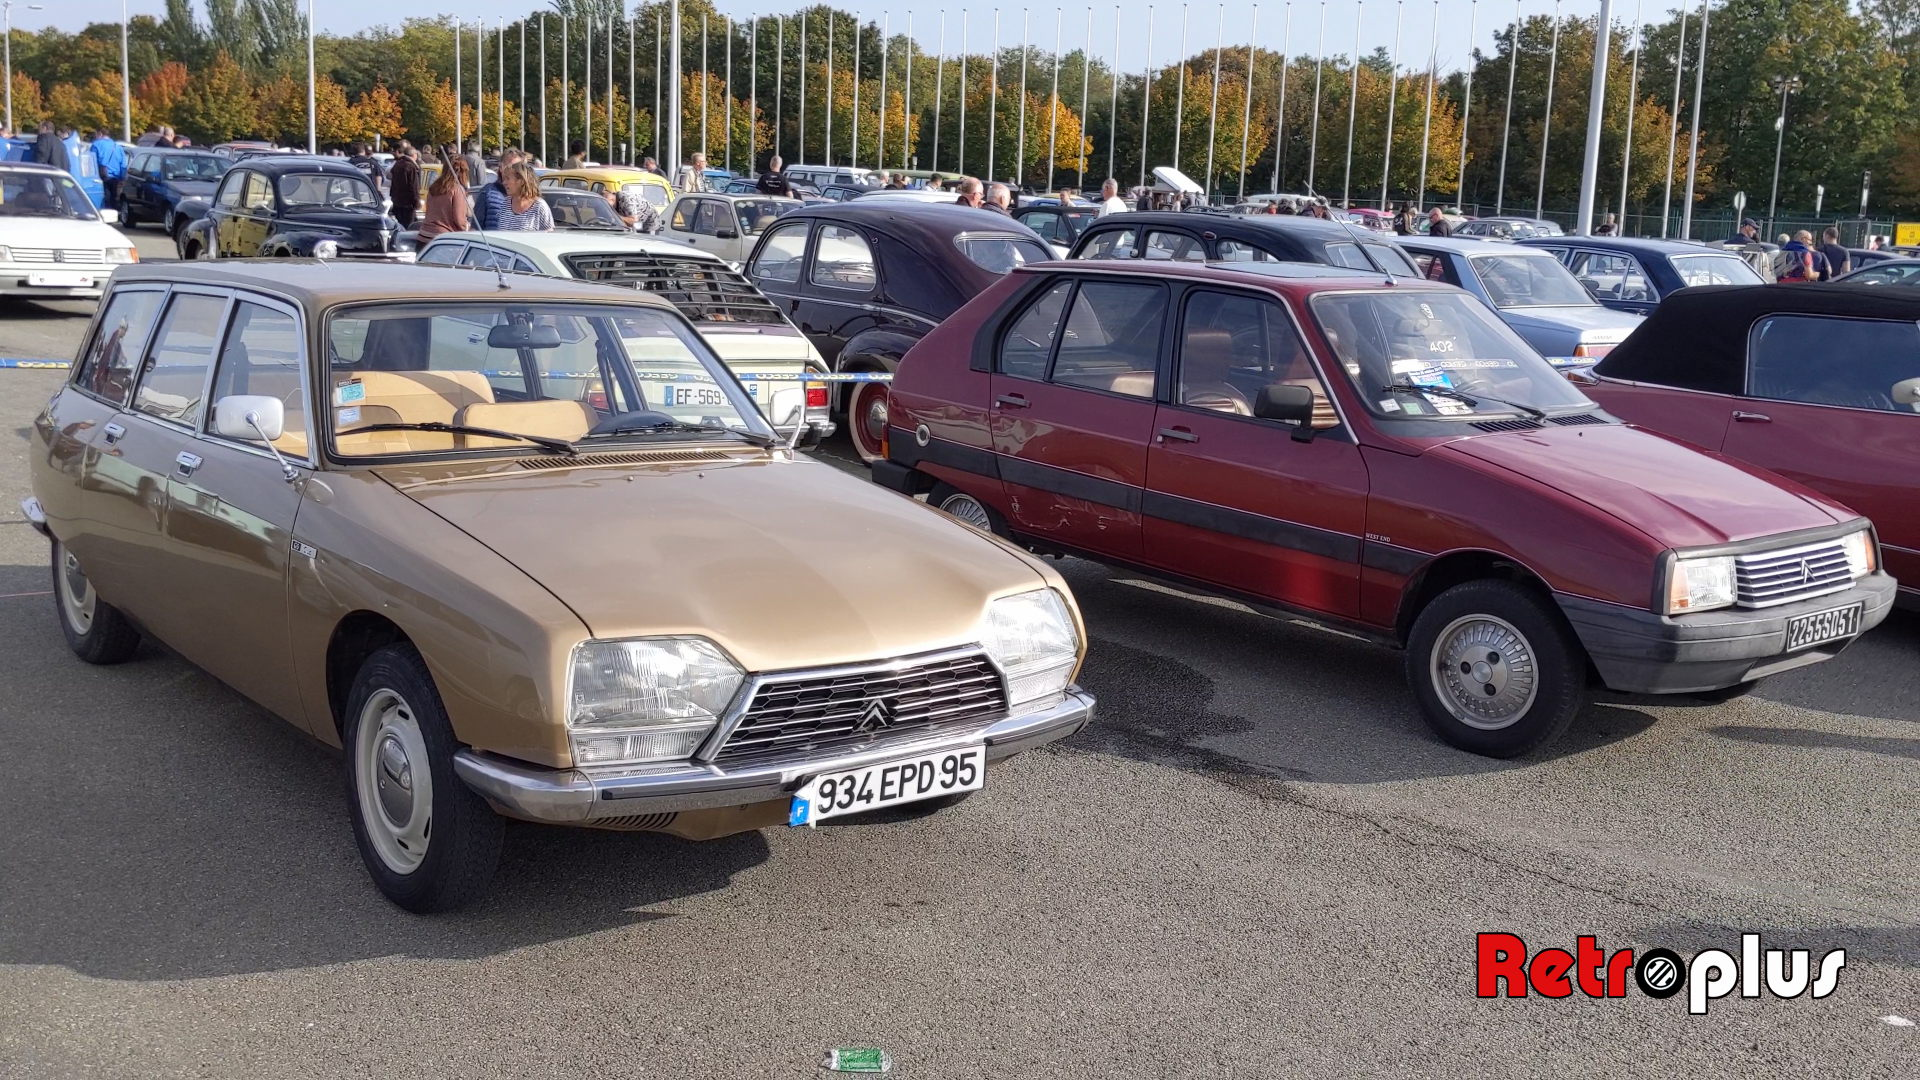 Automedon2019-parkingCitroen39